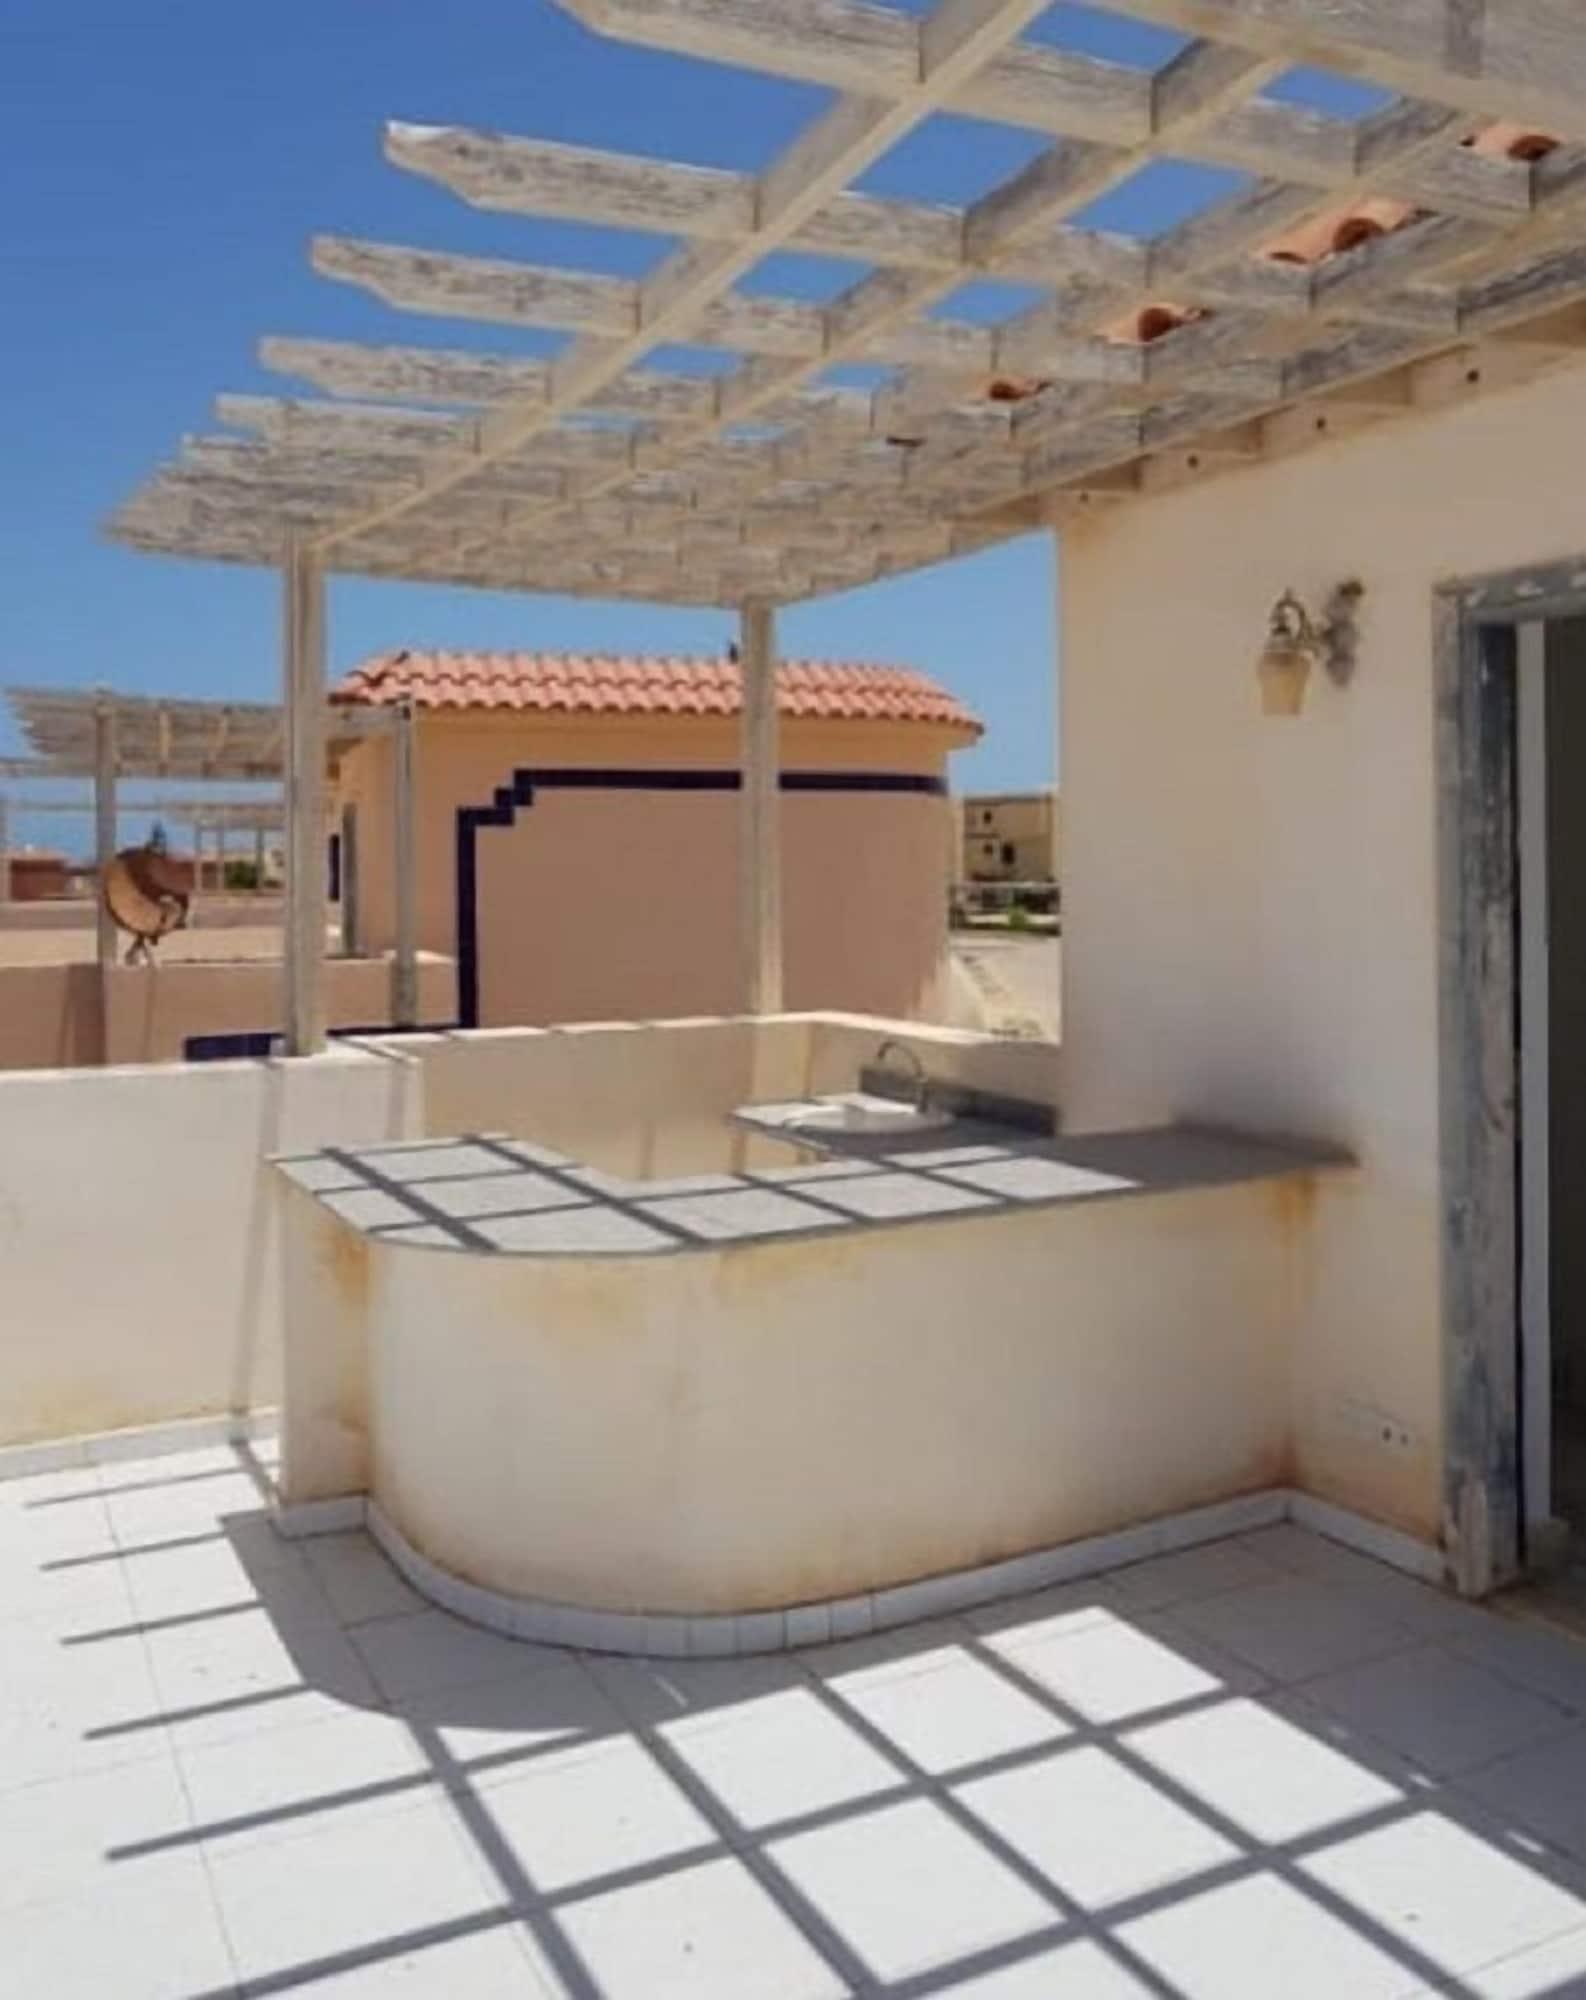 villa 30D Ghazala bay beside rixos, Ad-Dab'ah